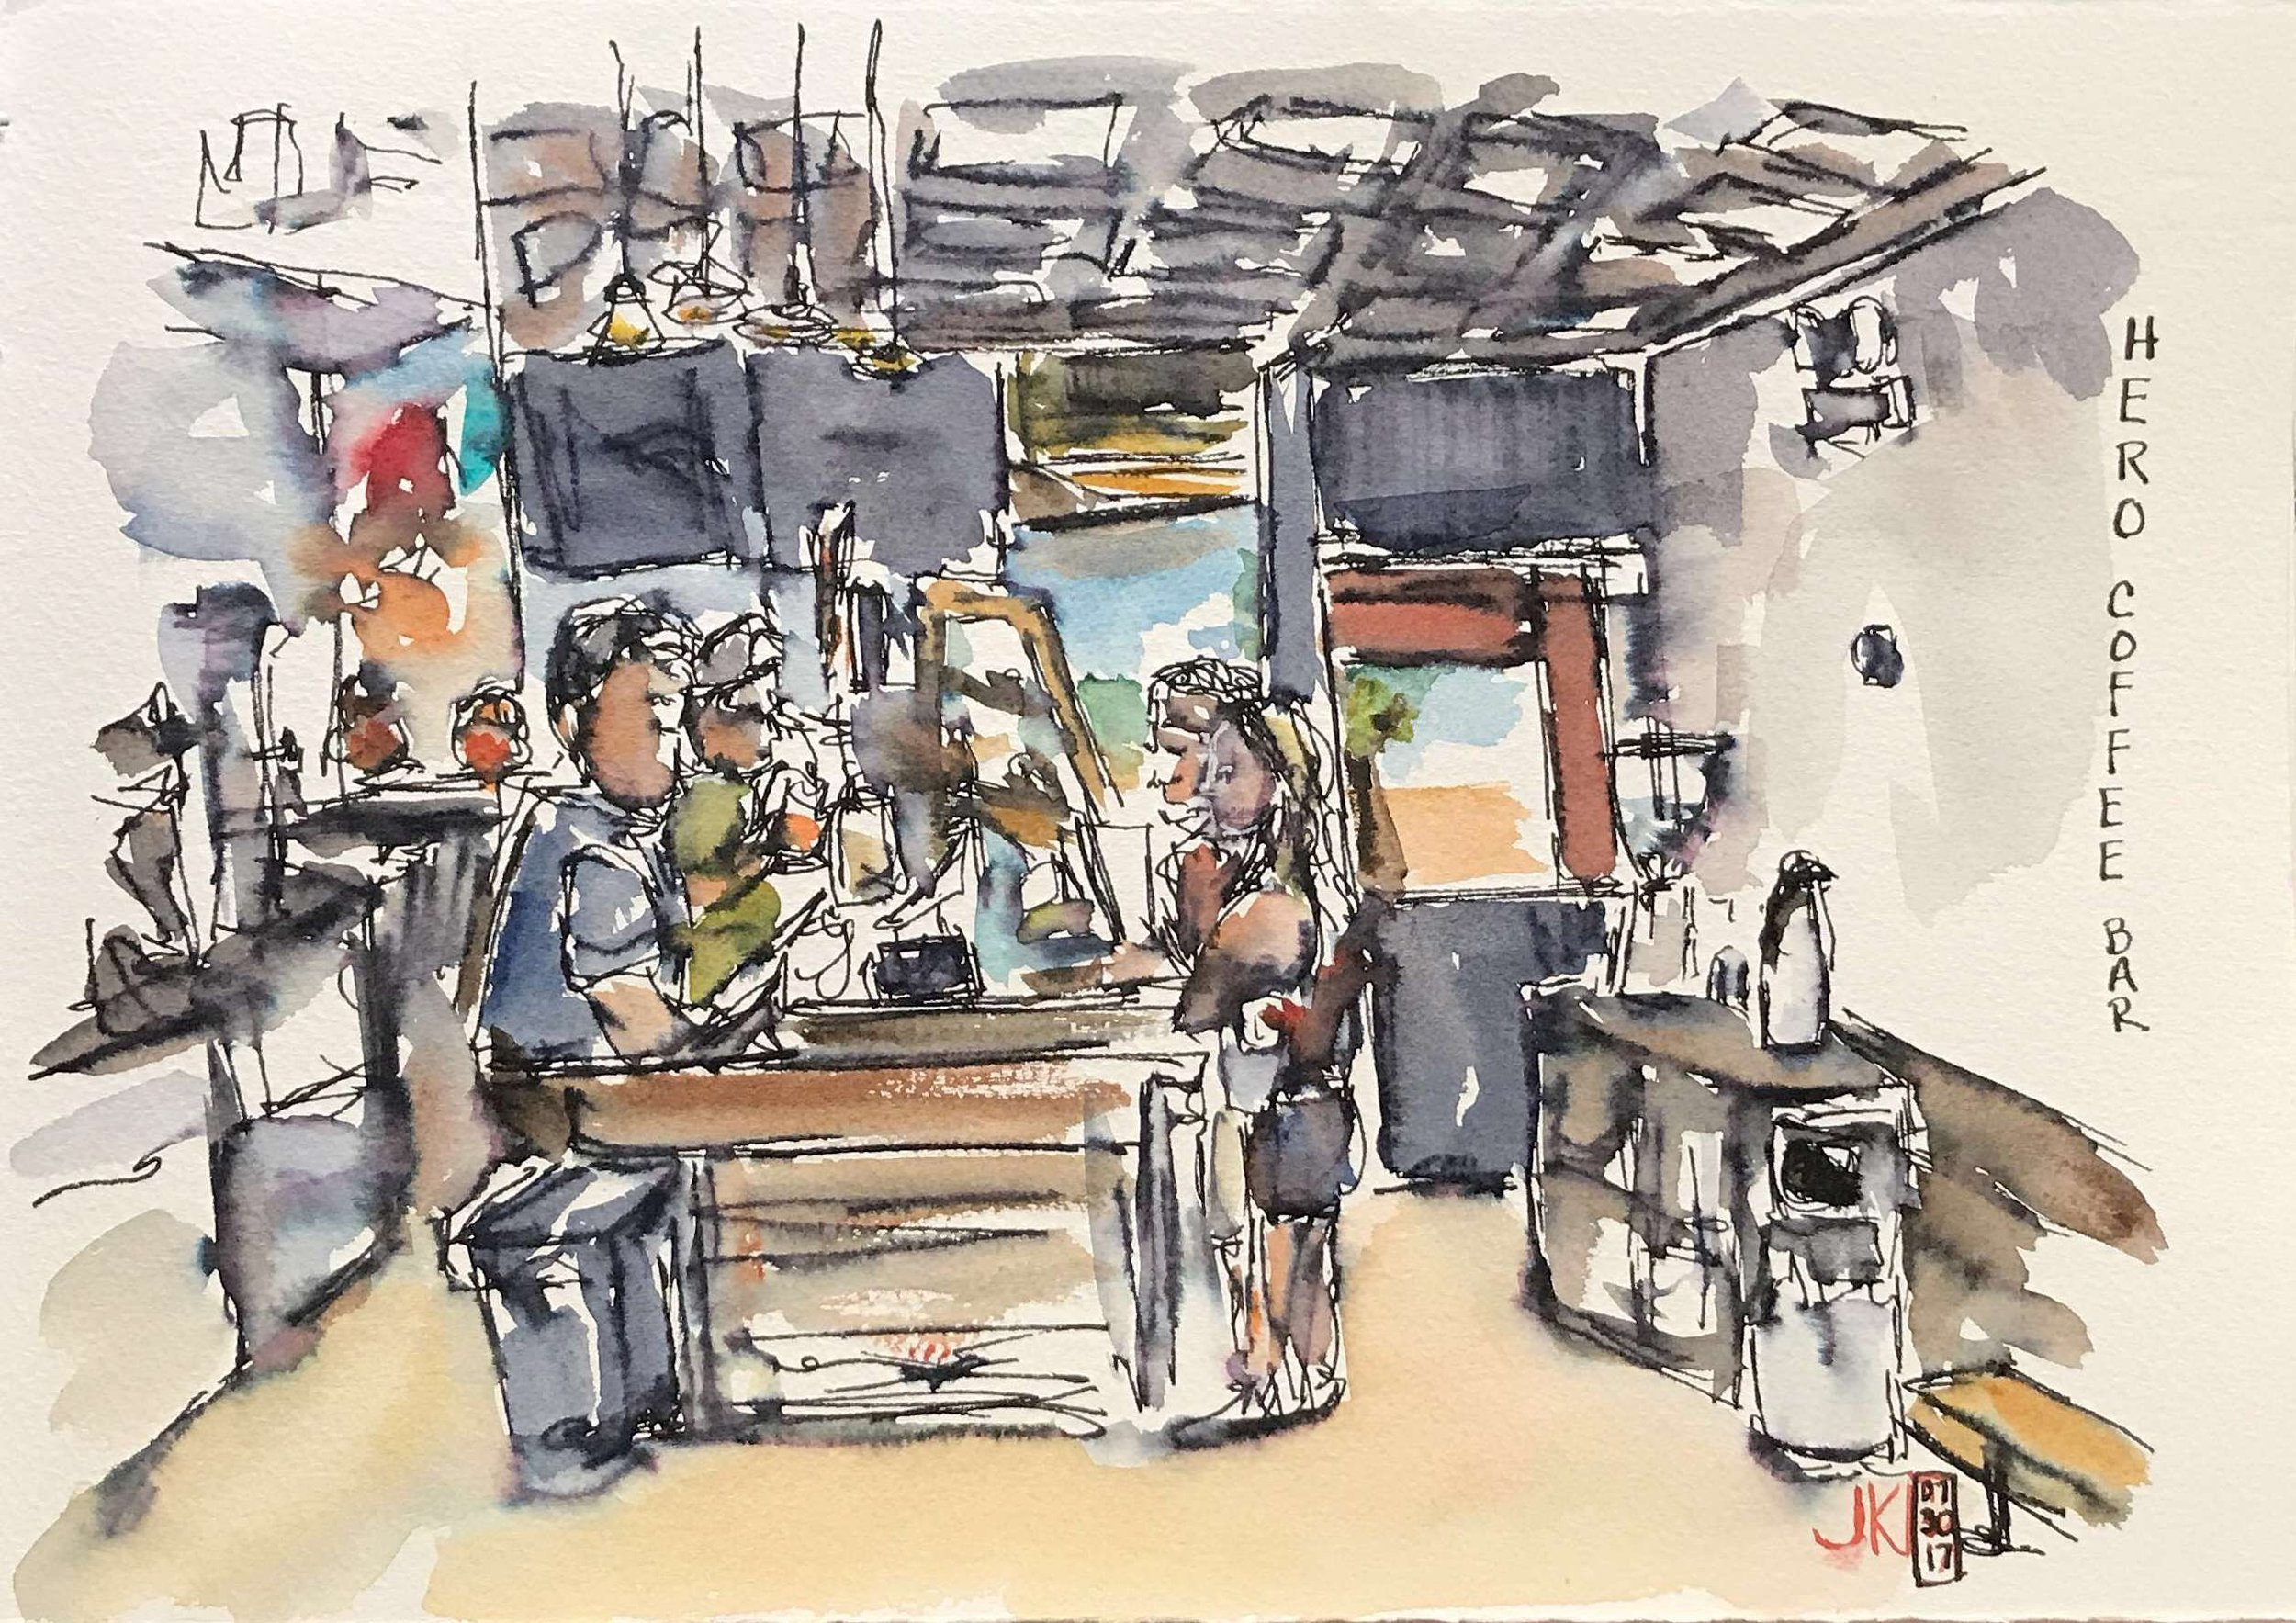 Hero Coffee Bar - near our hotel